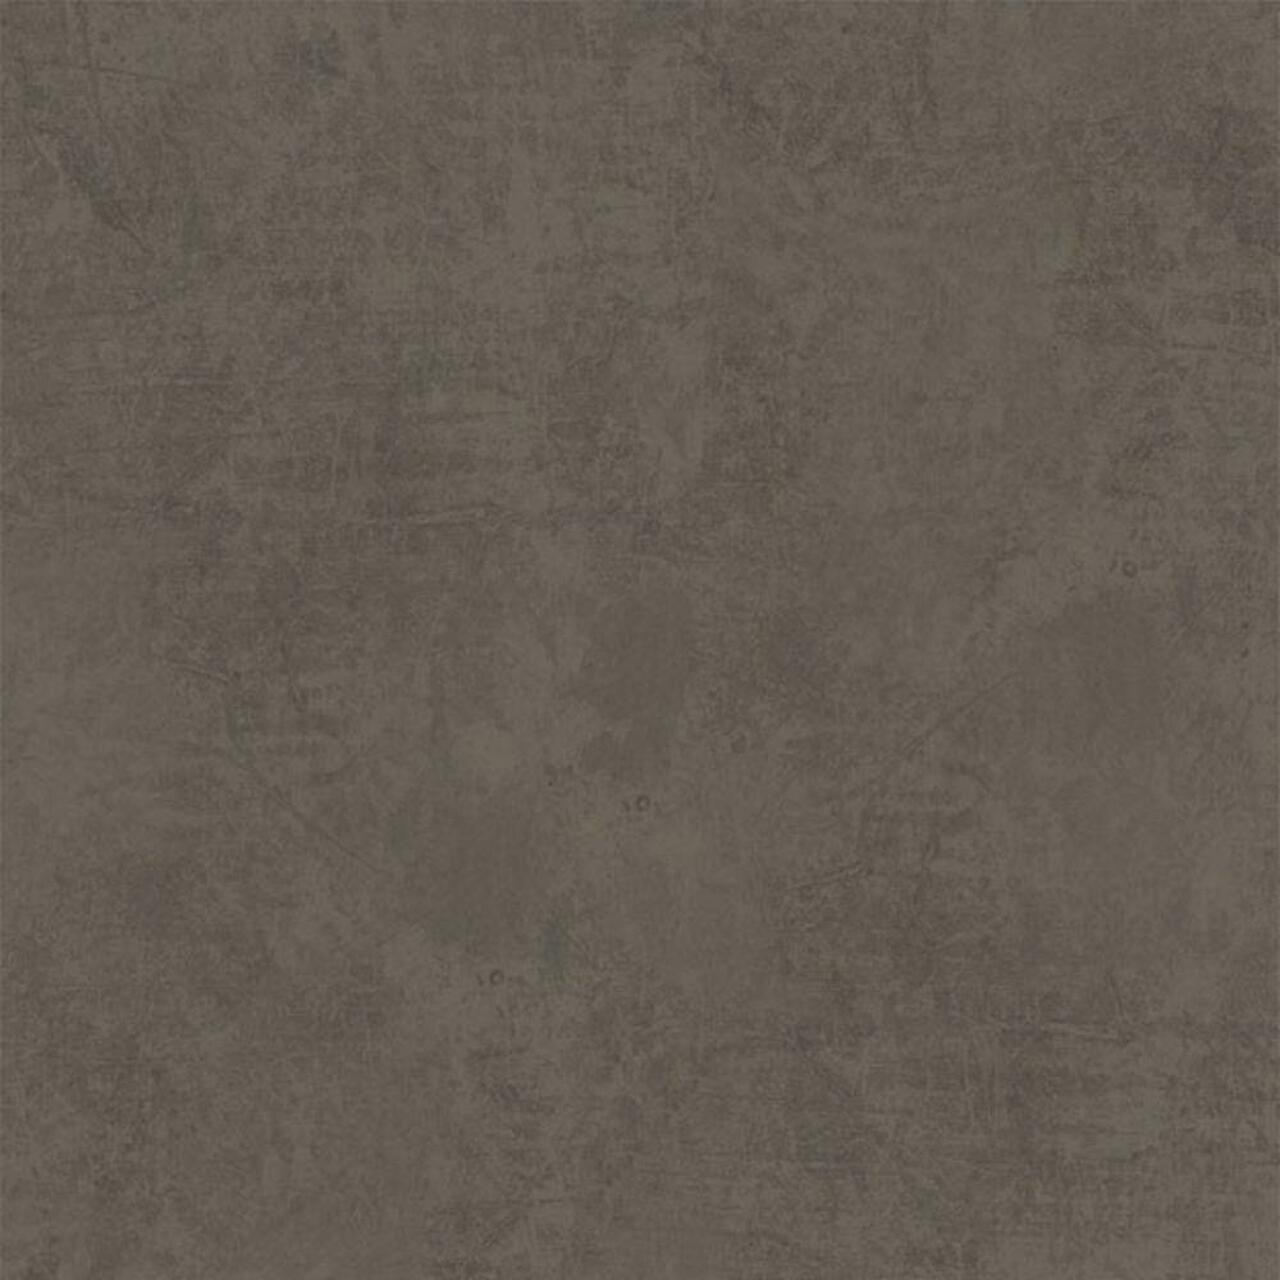 Galerie Suede Wallpaper   77702   Dark Brown 1280x1280